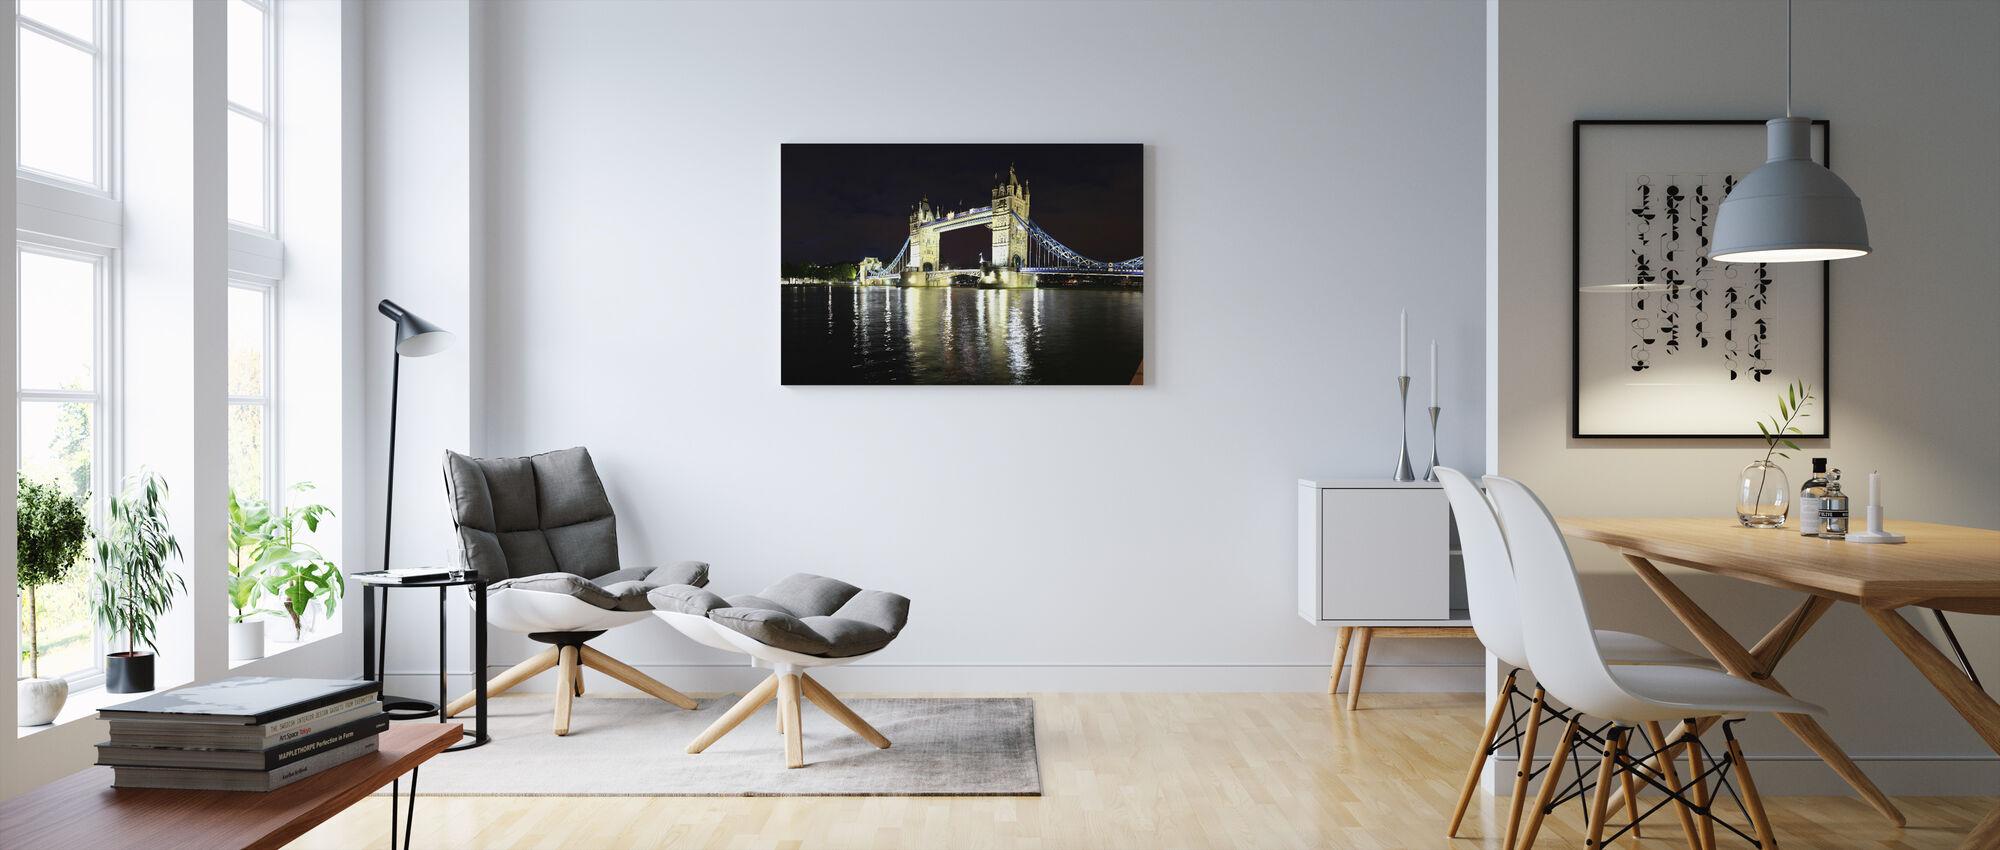 London Tower Bridge at Night - Canvas print - Living Room